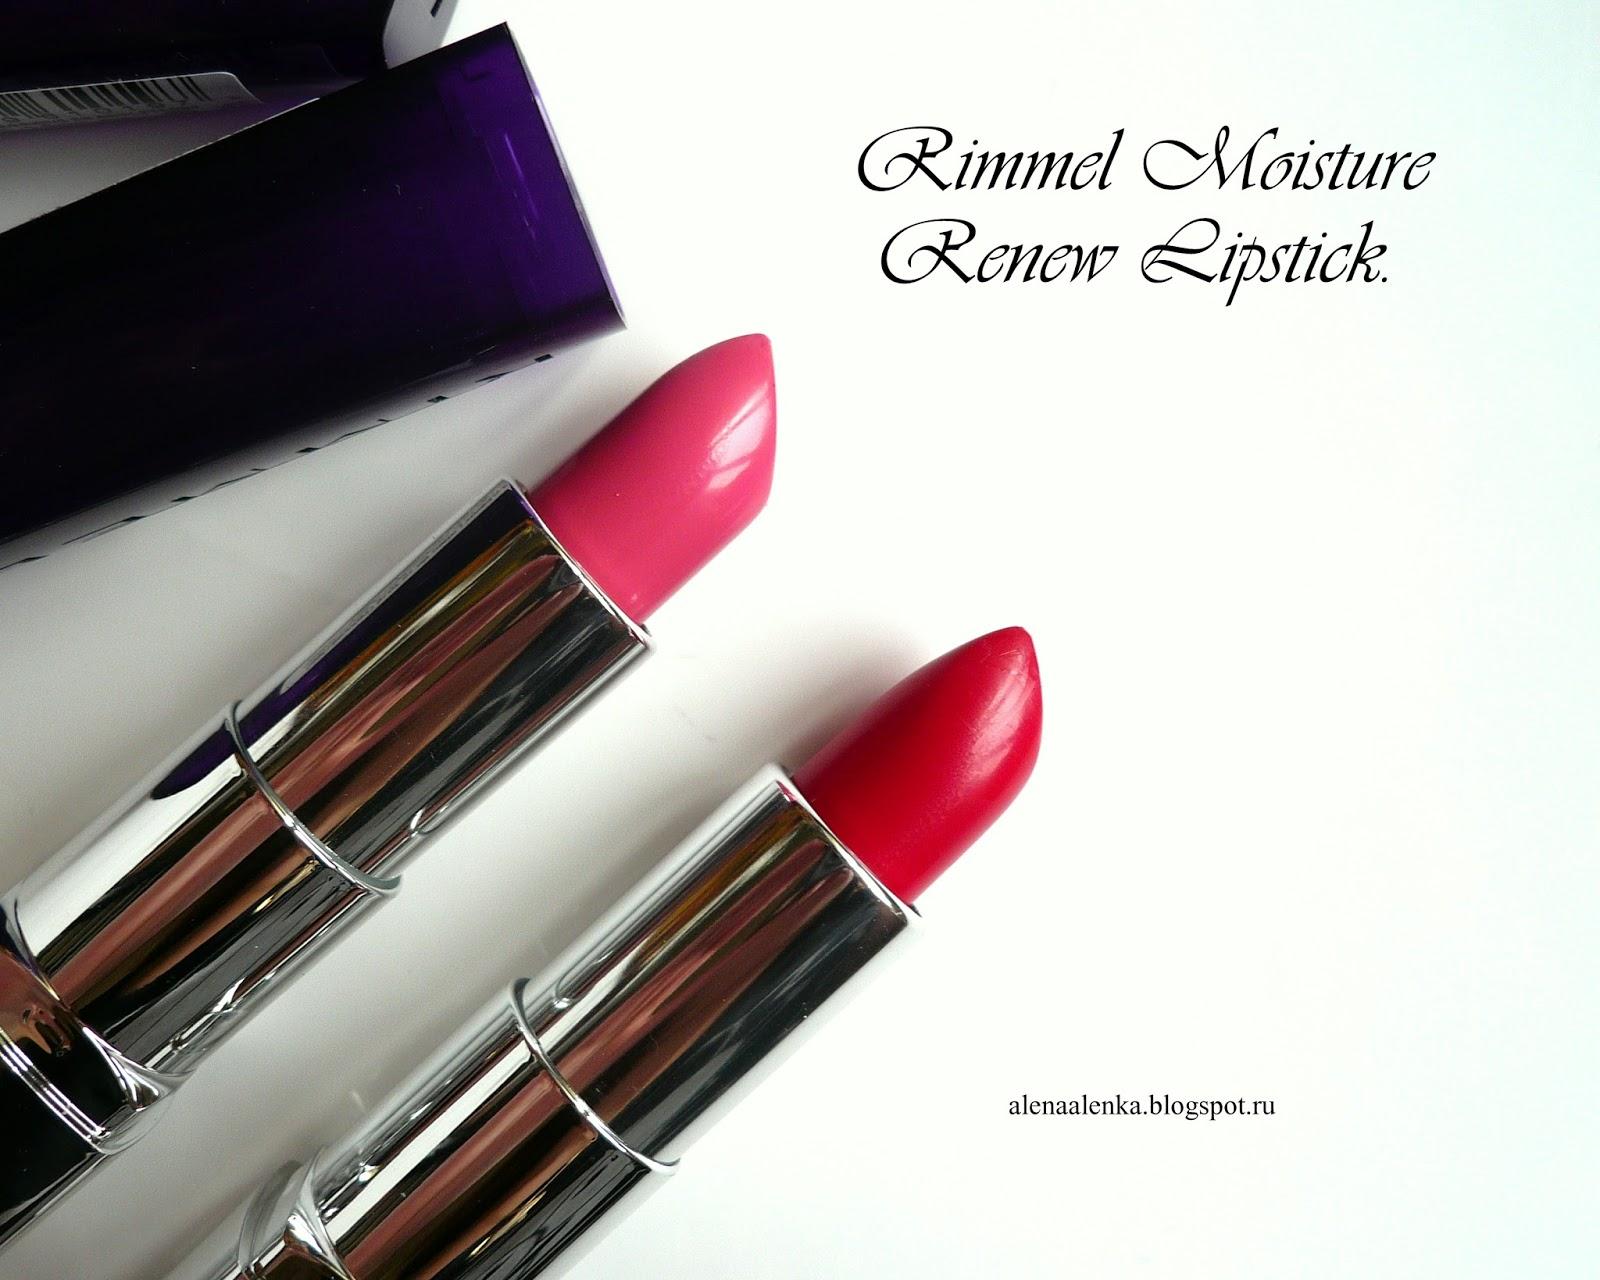 Rimmel помада, Rimmel Moisture Renew Lipstick, розовая помада Rimmel, малиновая помада Rimmel,